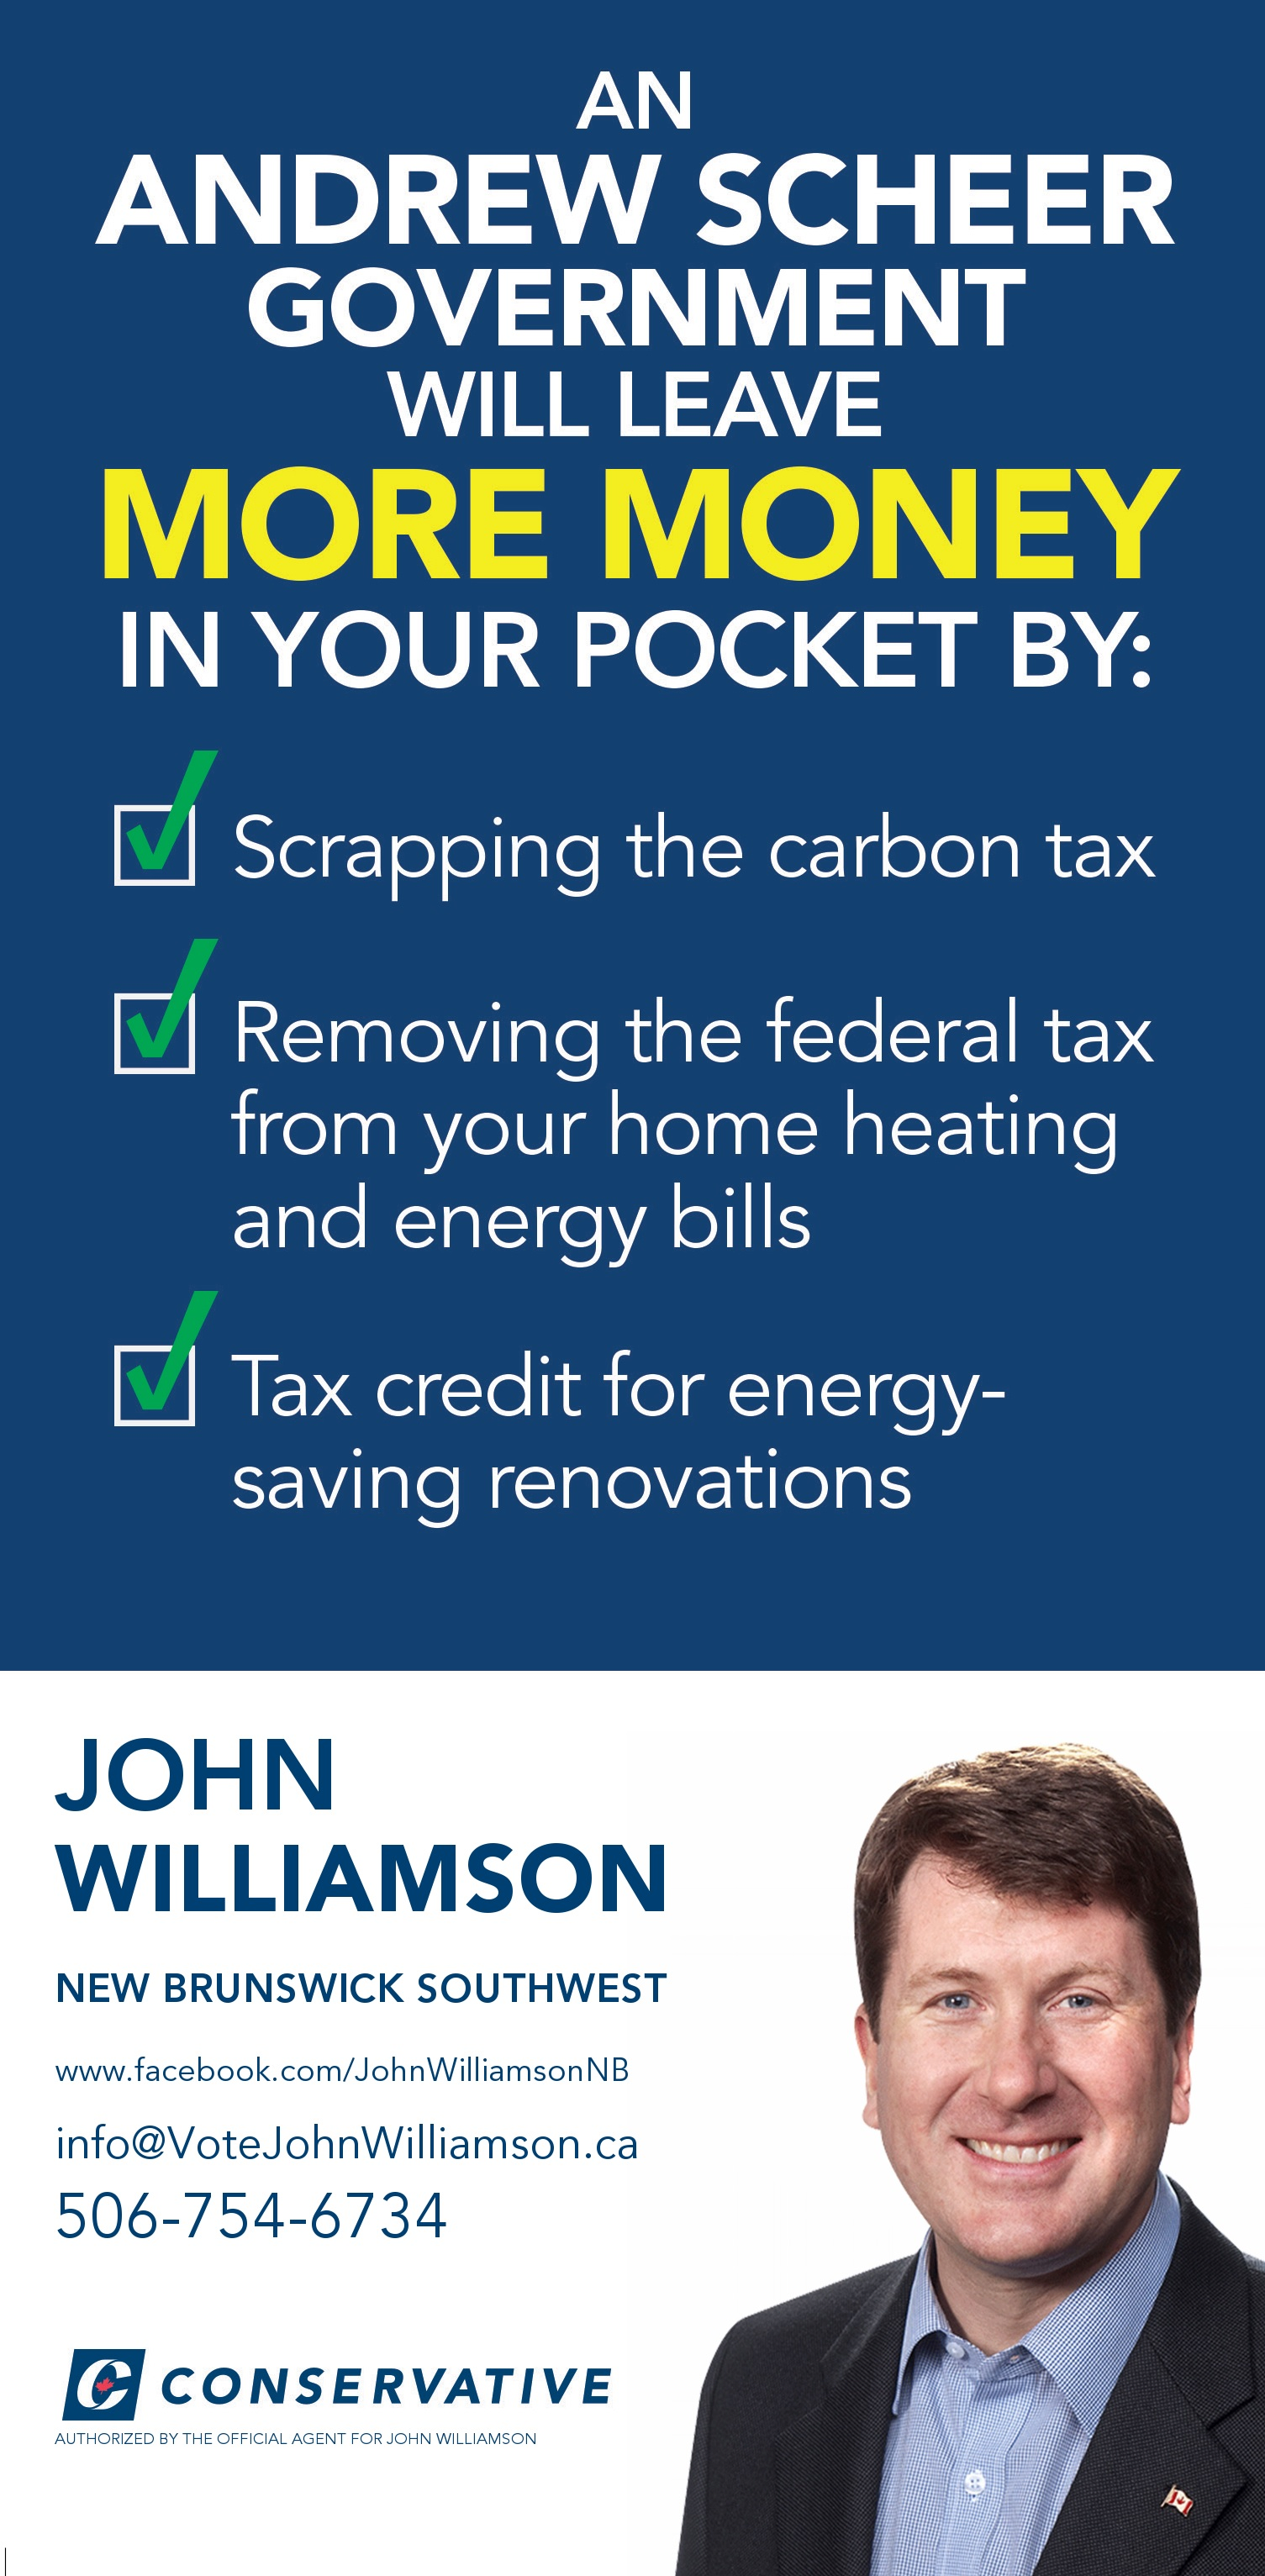 2019-07-16_JW_AS_carbon_tax_alternative.jpg